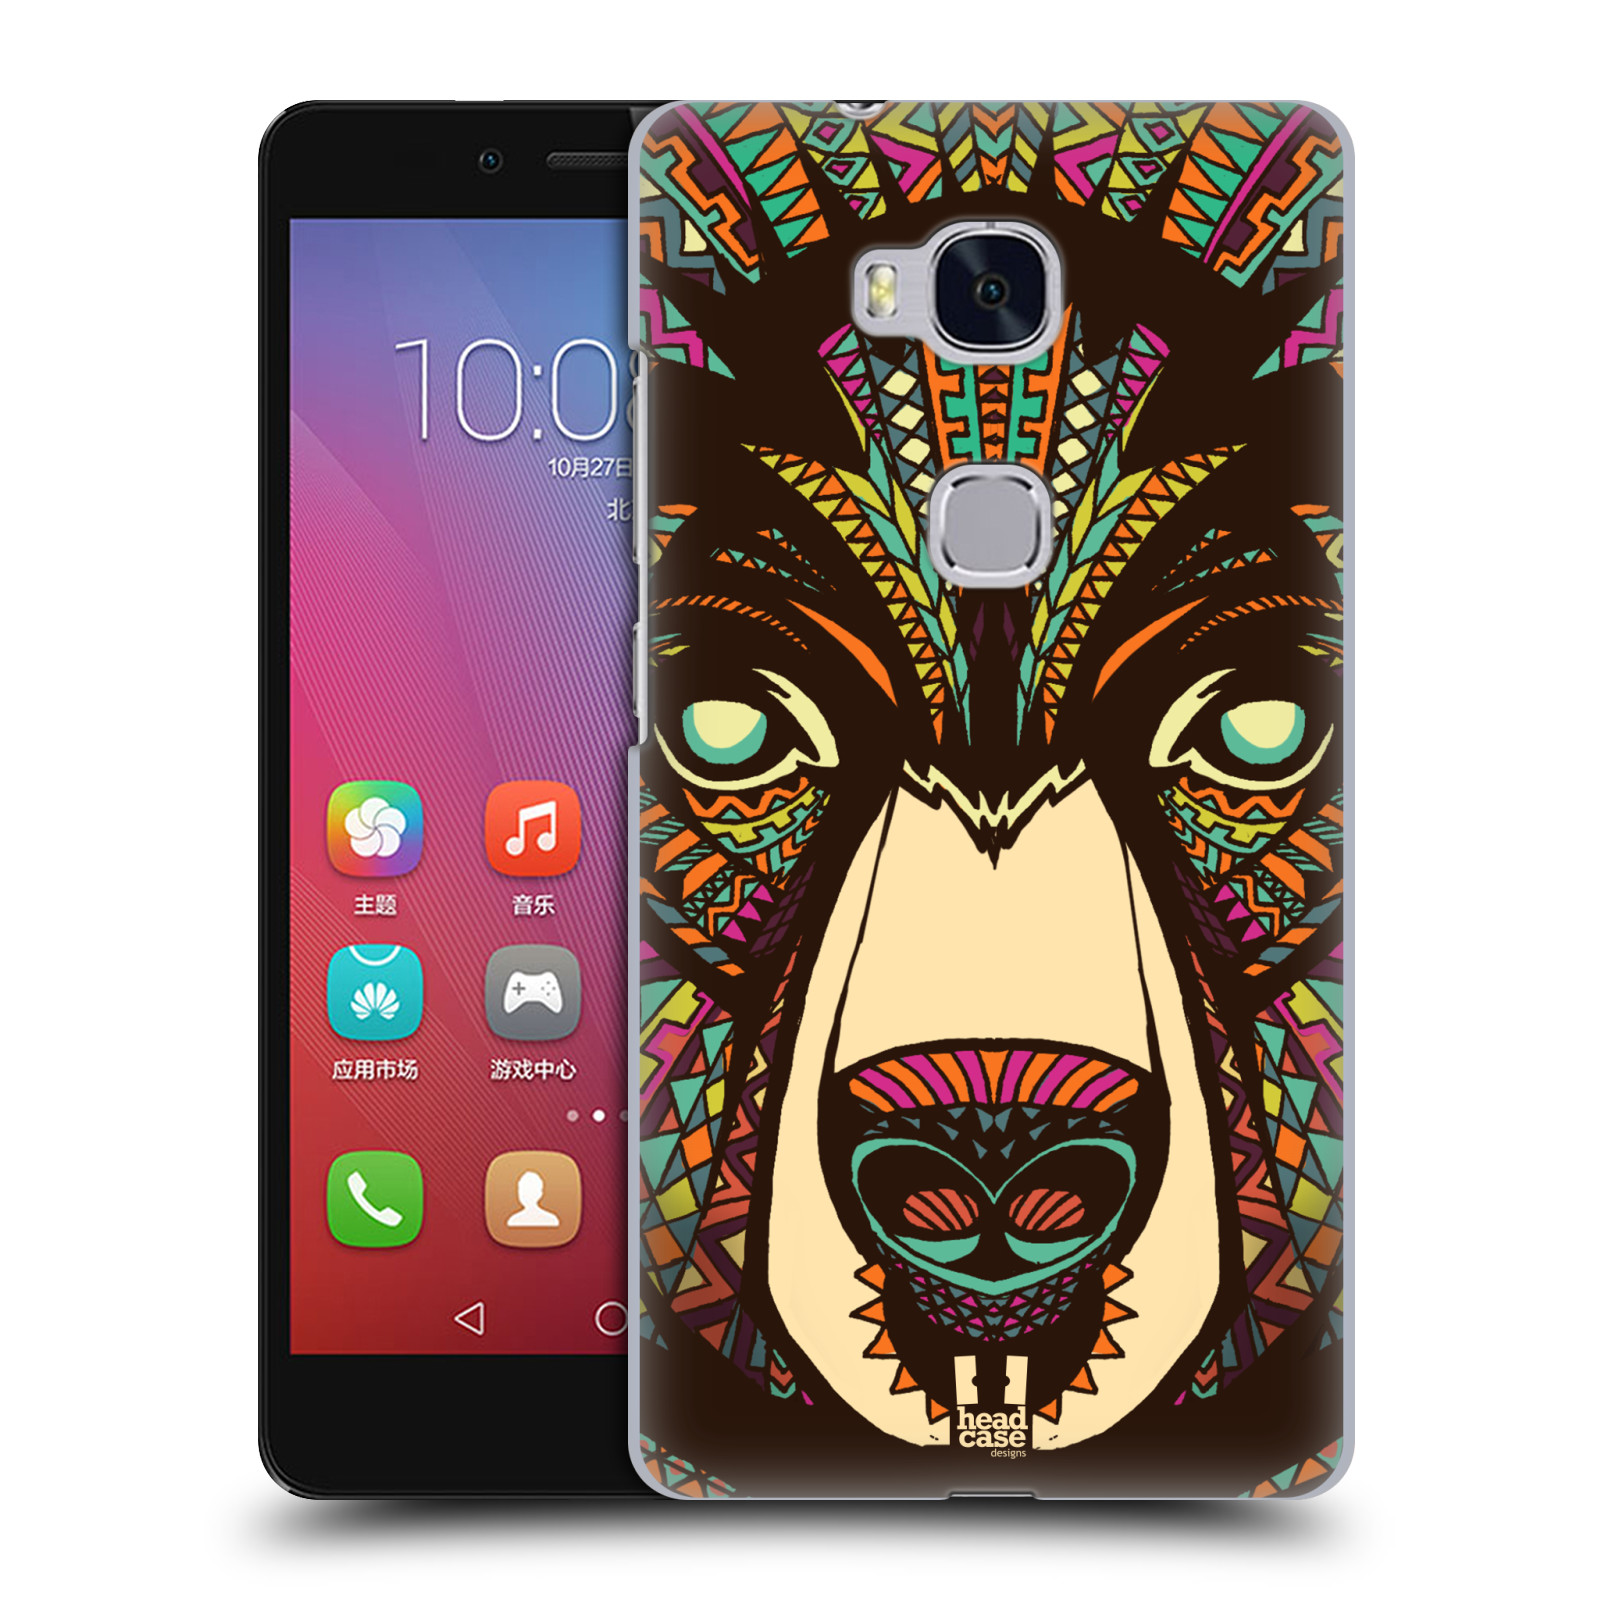 HEAD CASE pevný plastový obal na mobil HUAWEI HONOR 5X vzor Aztécký motiv zvíře medvěd